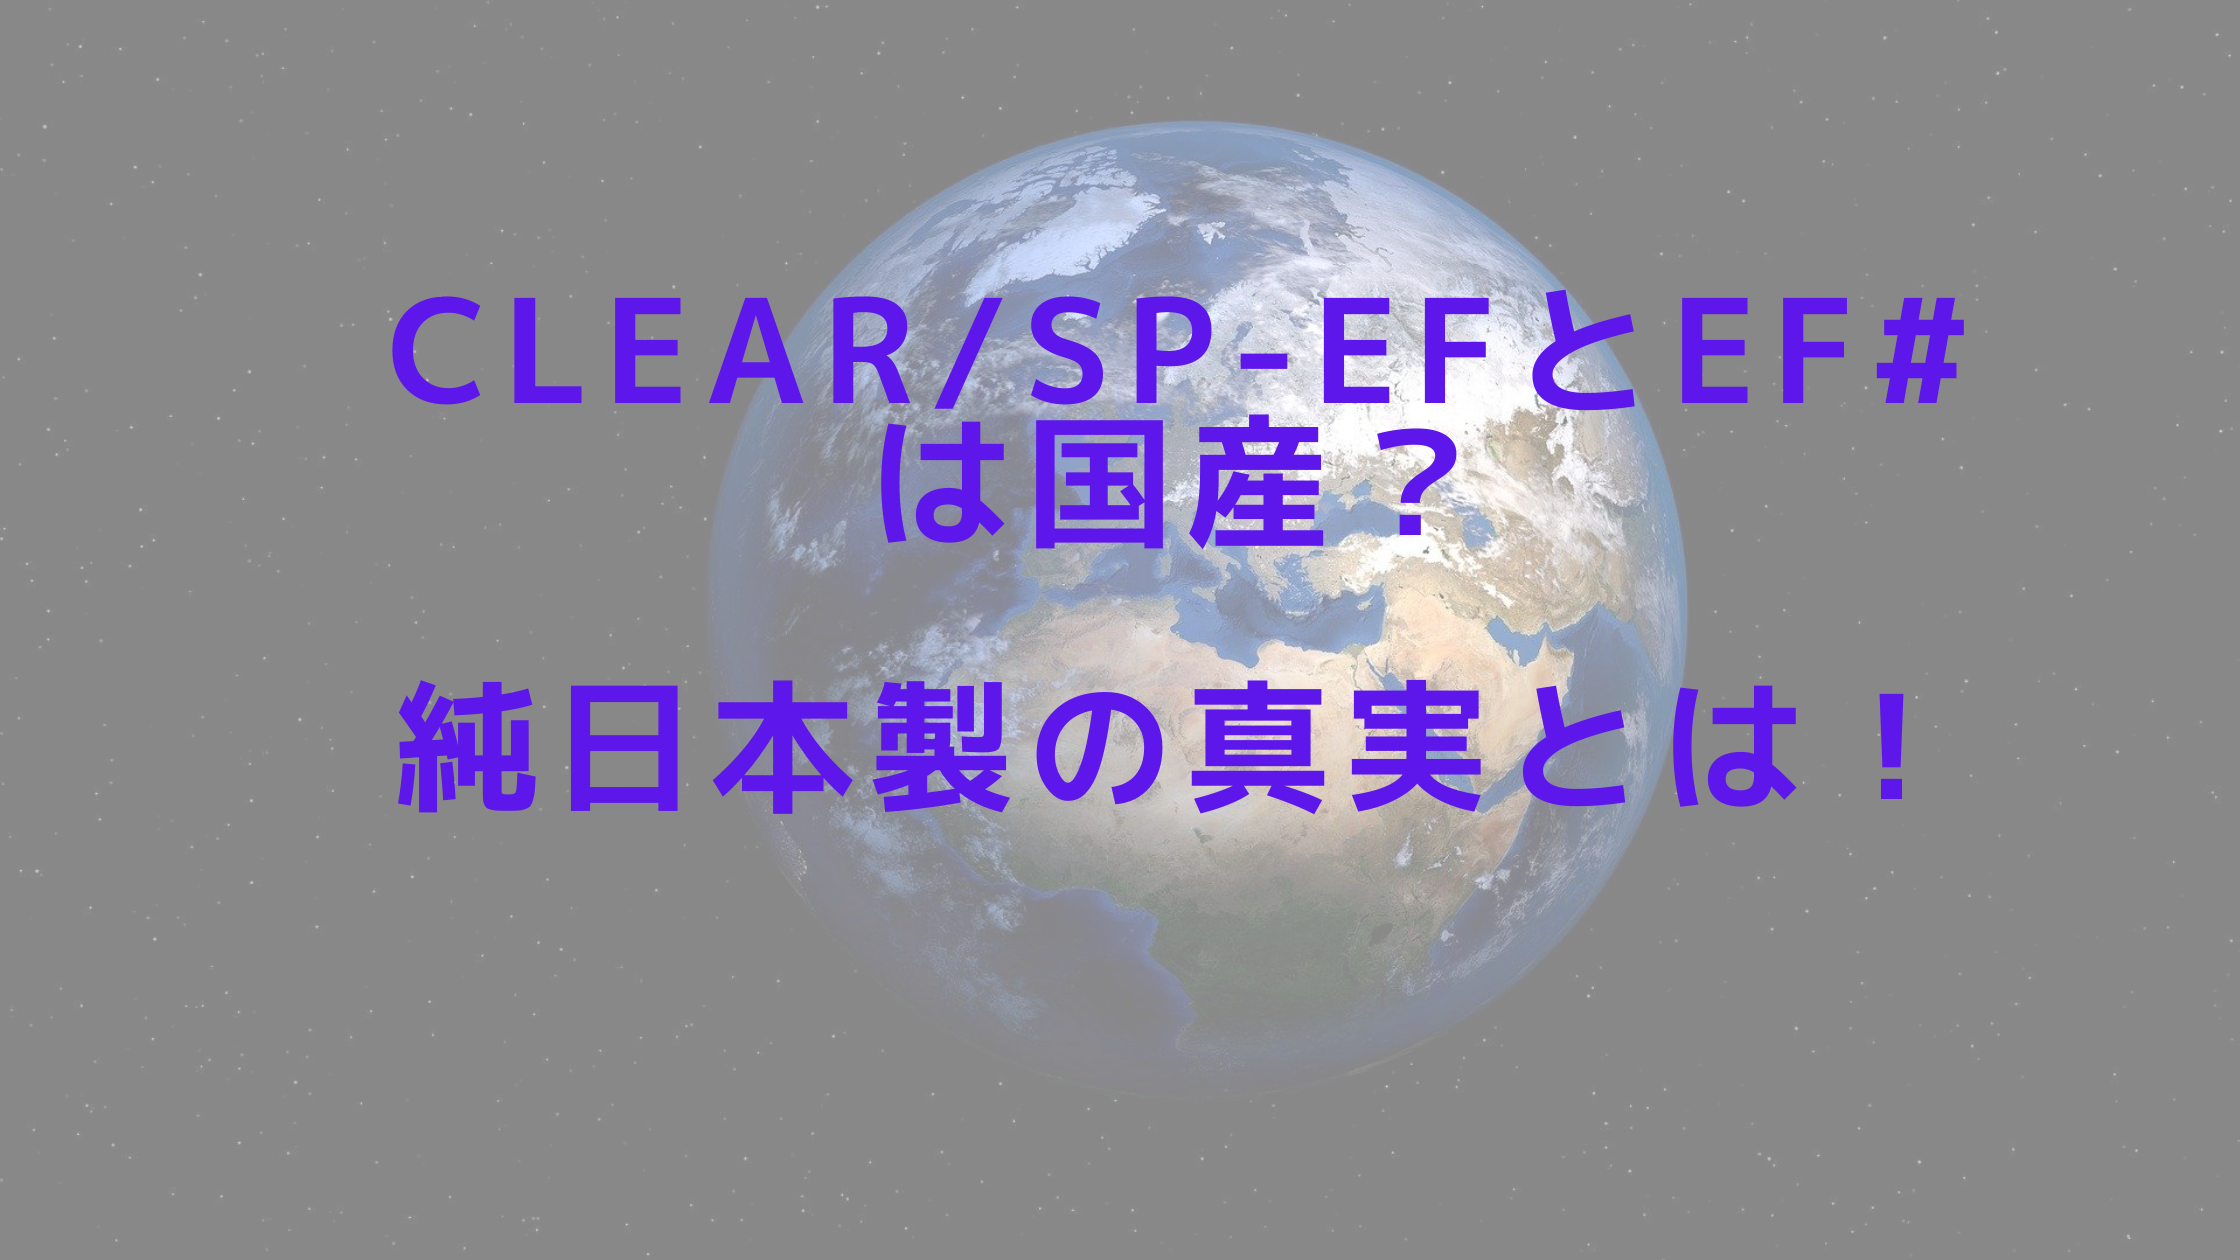 CLEAR/SP-efとef#は国産?純日本製の真実とは!